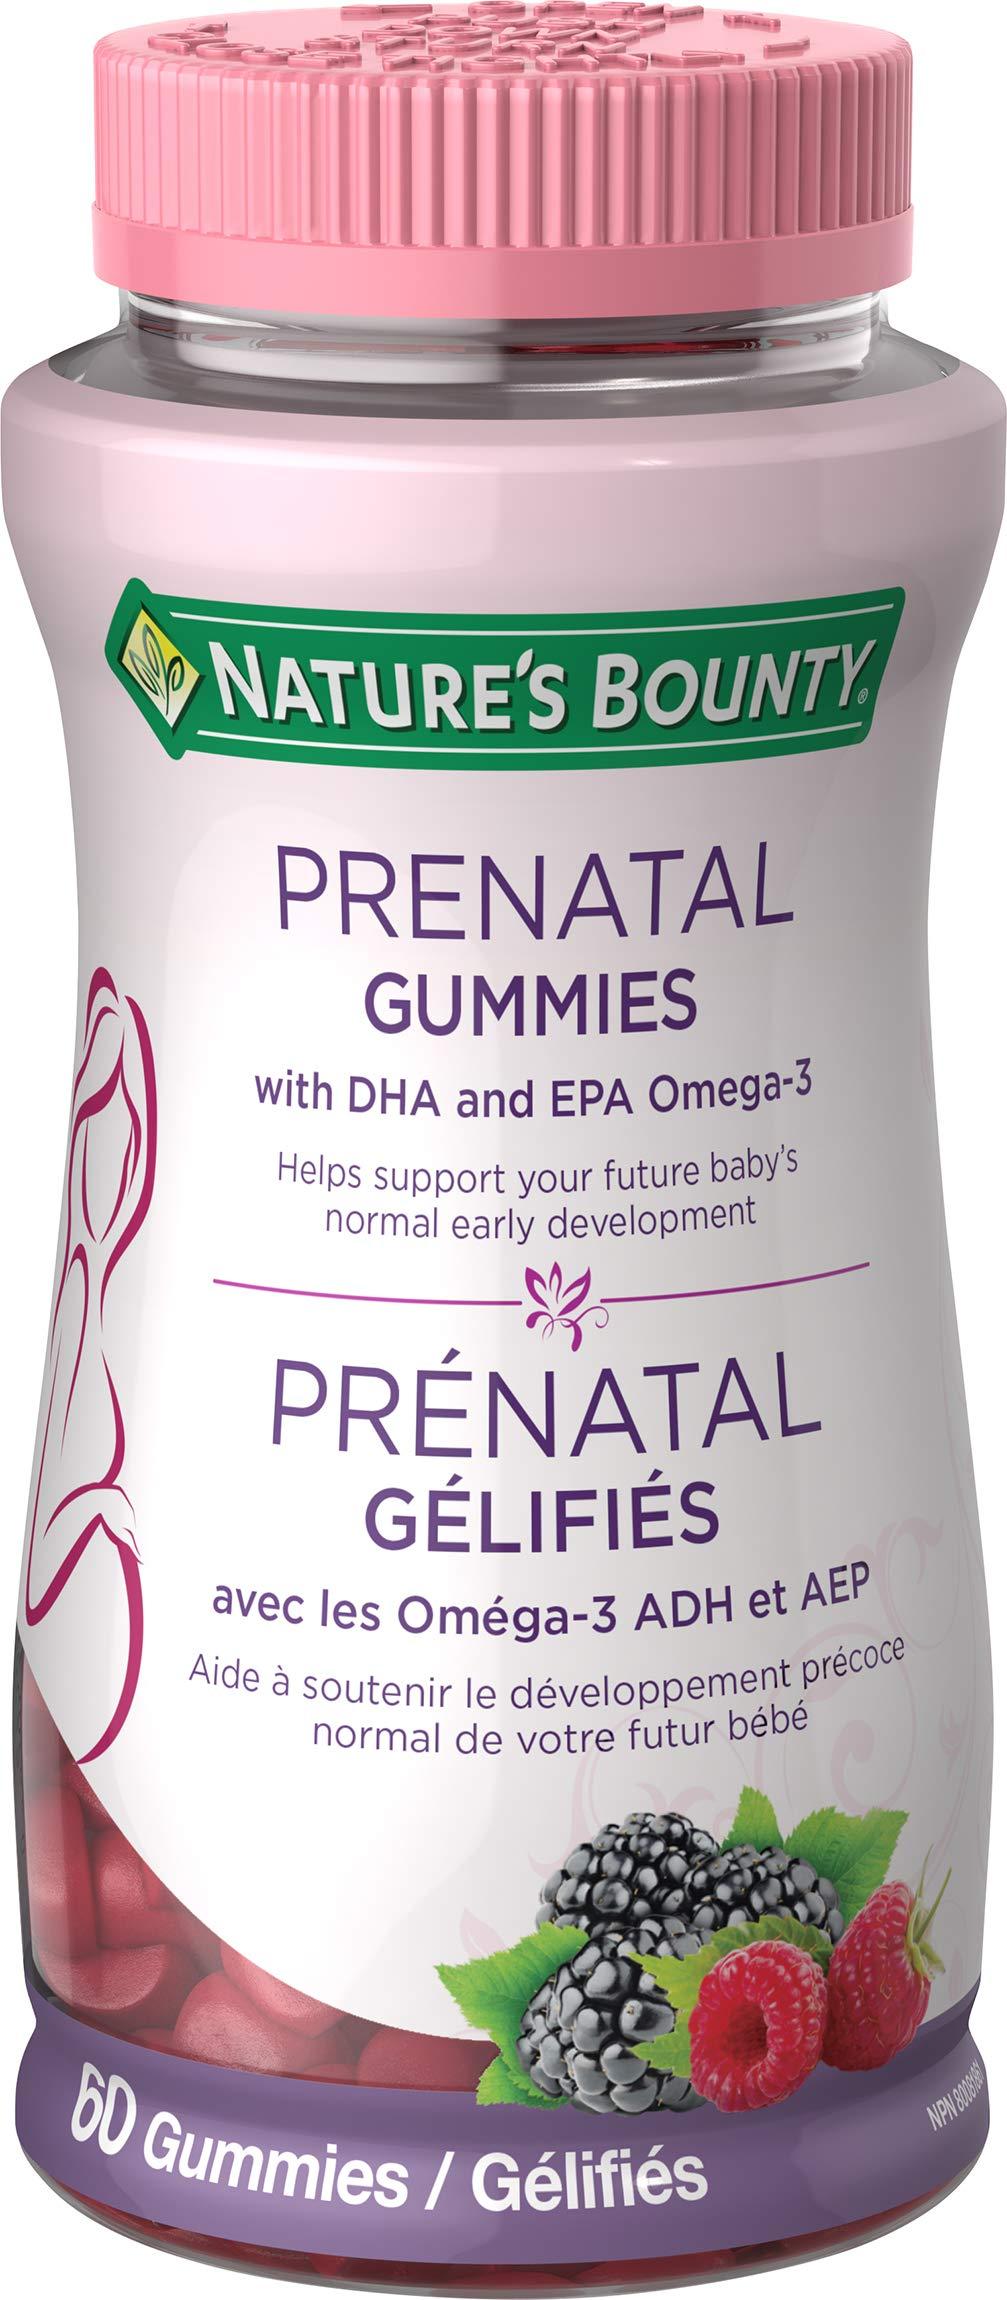 Nature's Bounty Prenatal Gummies, 60 Gummies